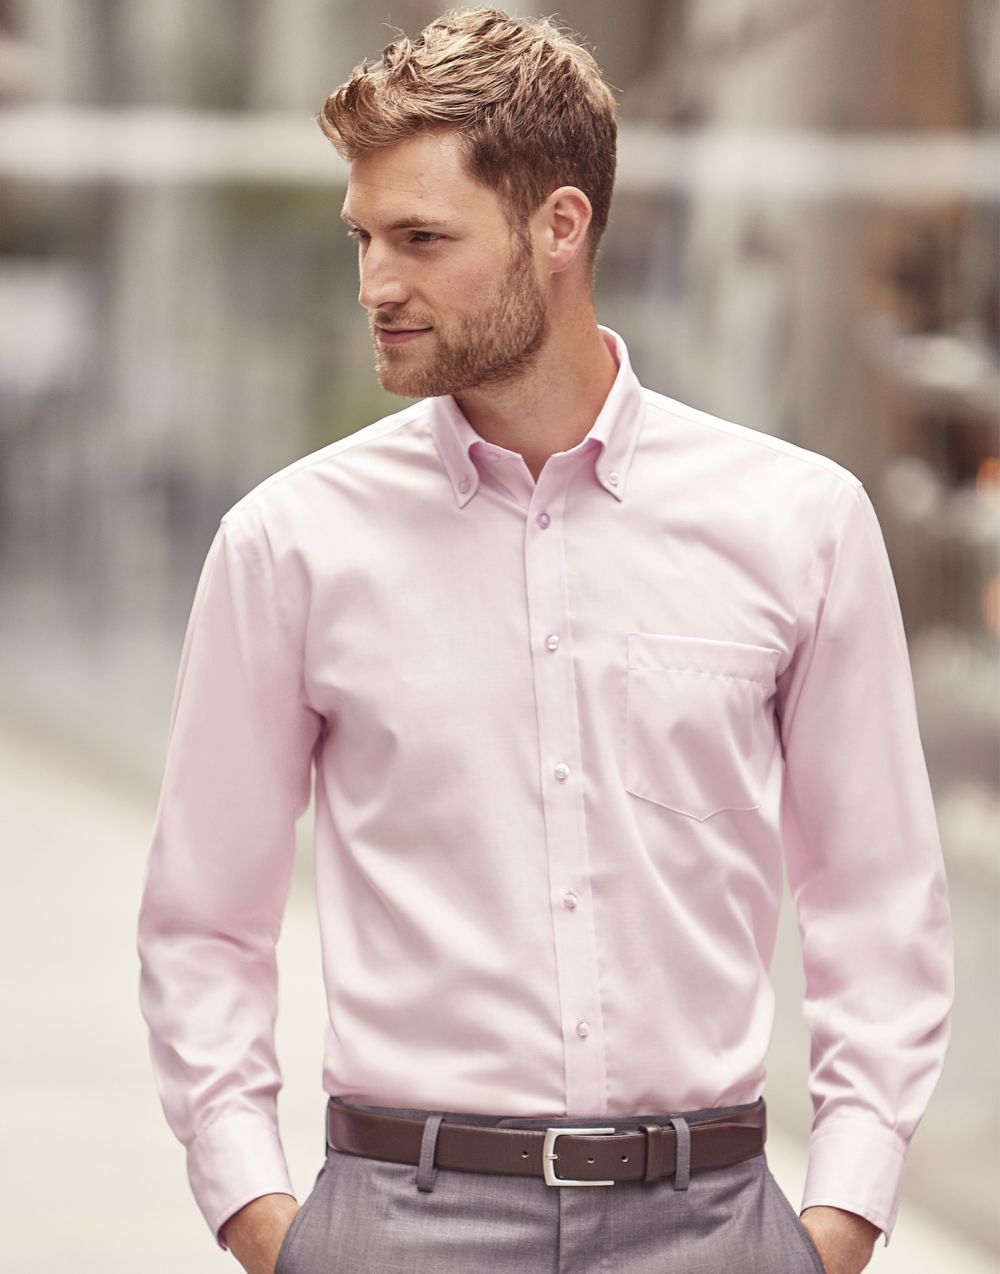 Camisas manga larga russell manga larga hombre con impresión imagen 3